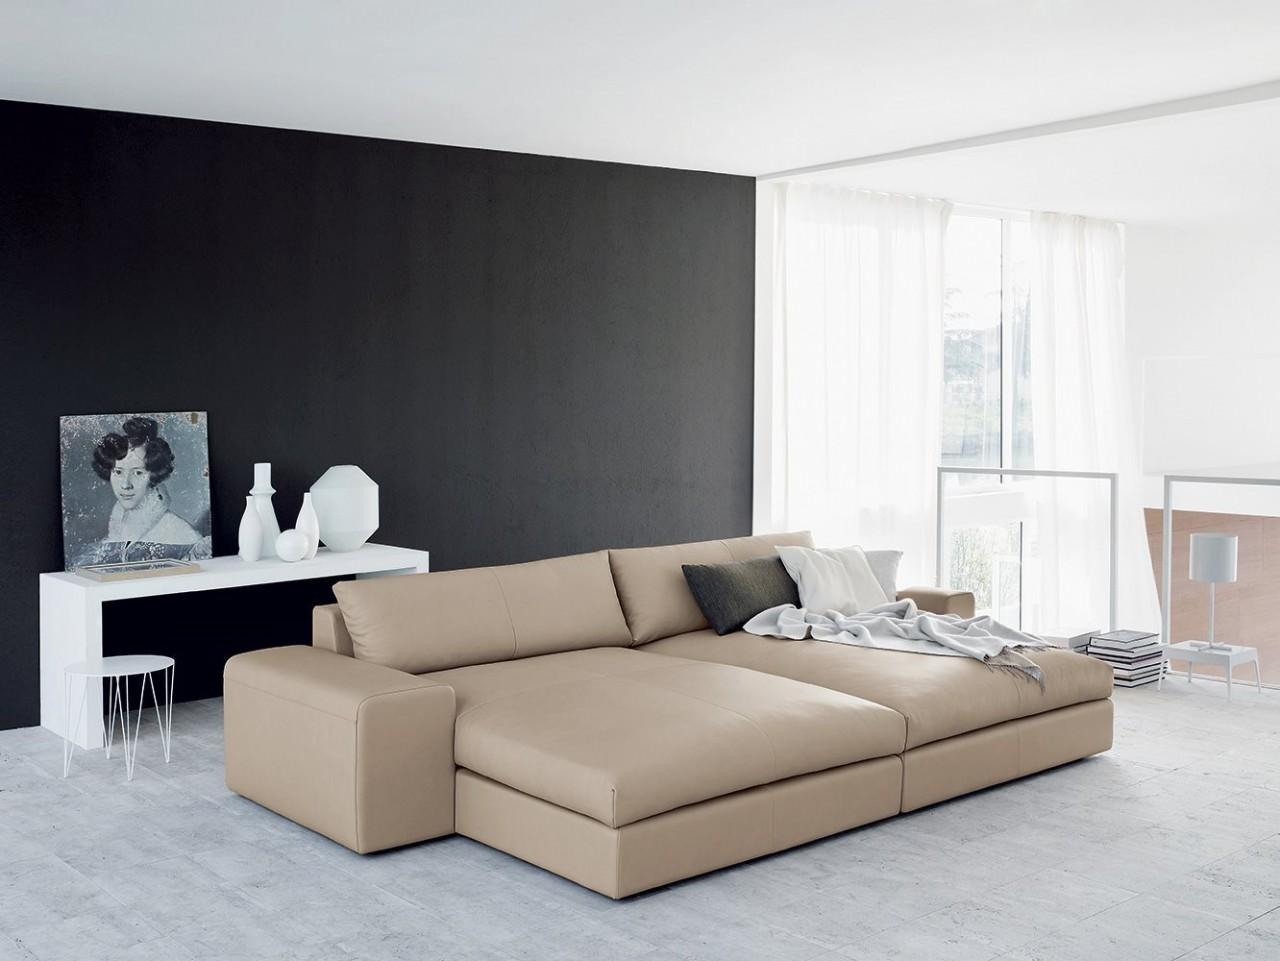 Sofas Interio Livingroom Sofa Purchase Online India Godrej Interio